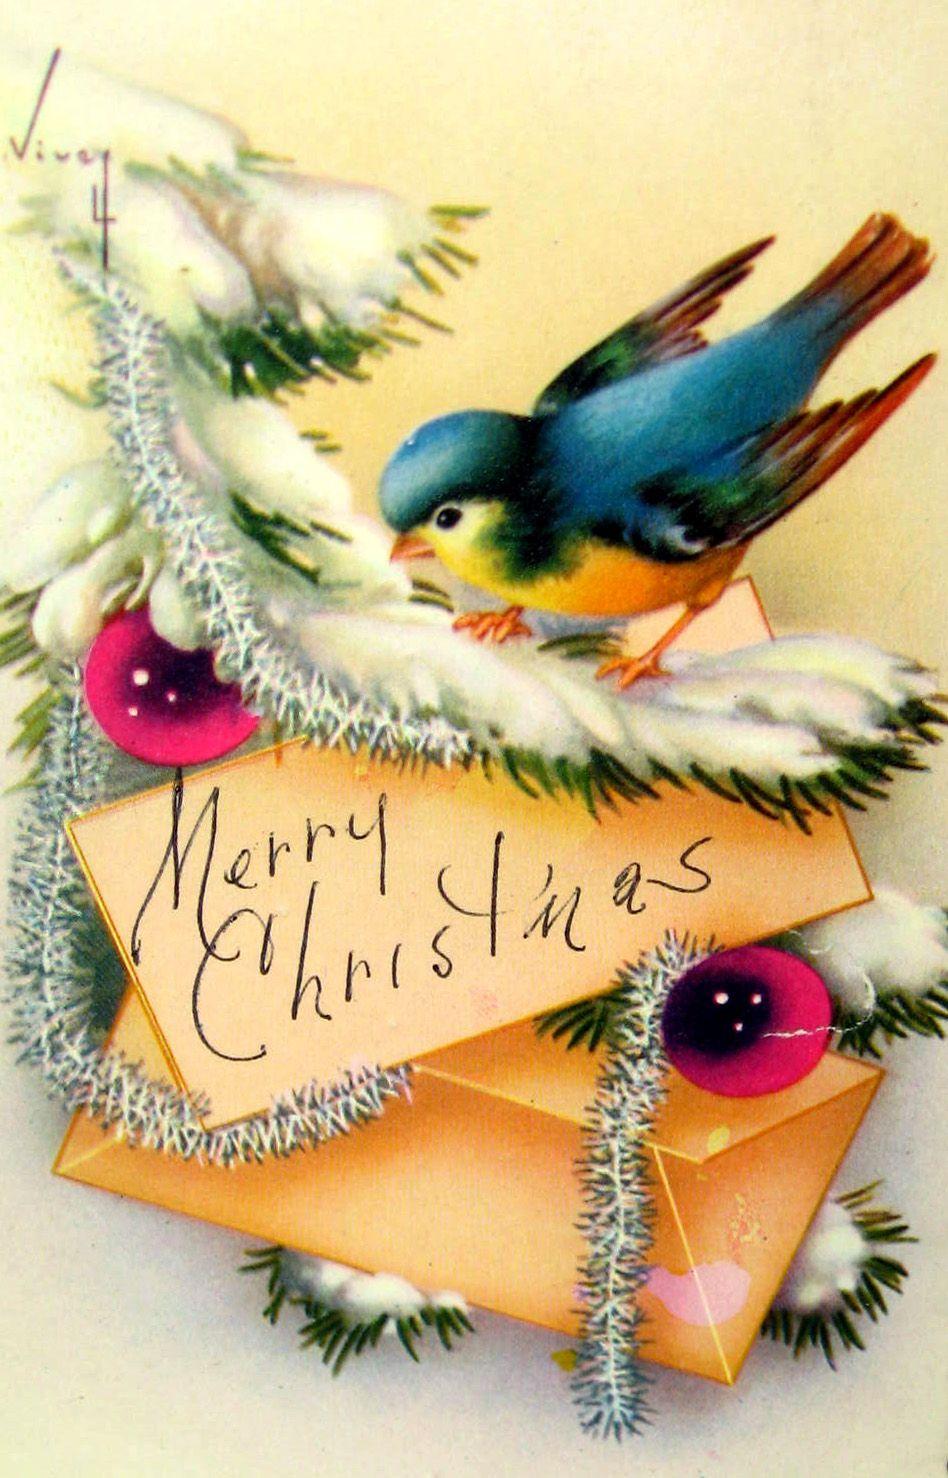 Vintage bluebird Christmas card.